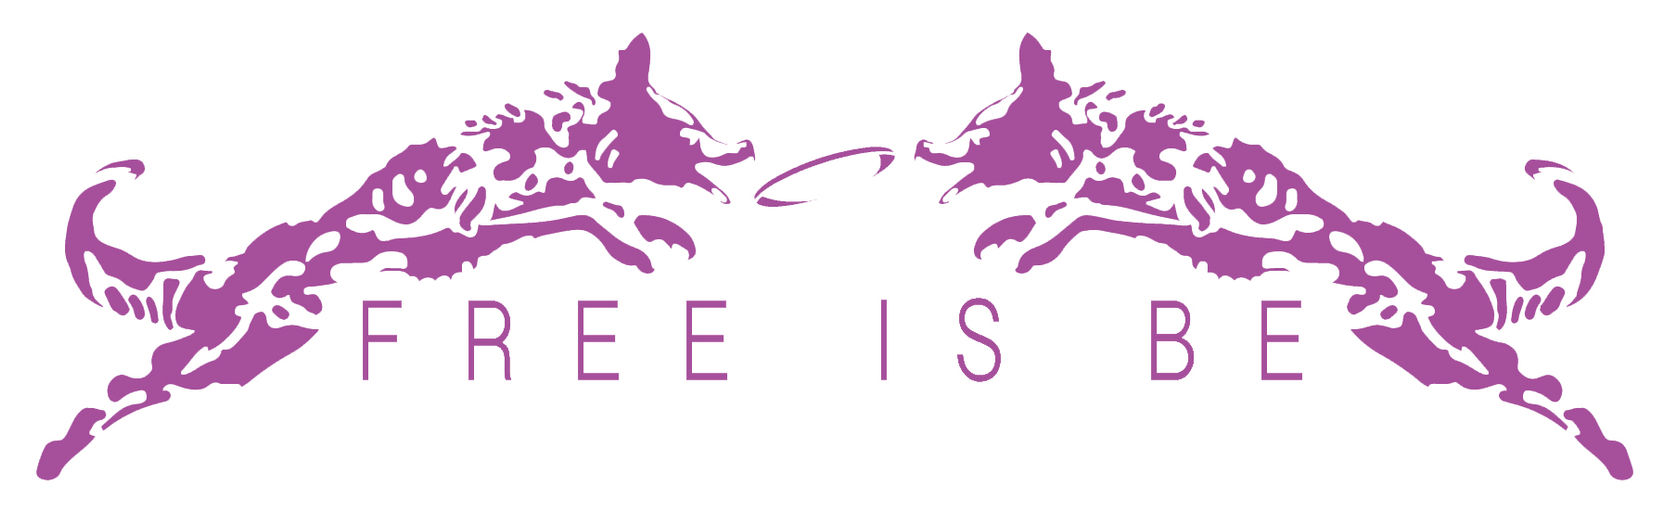 logo#104.jpg